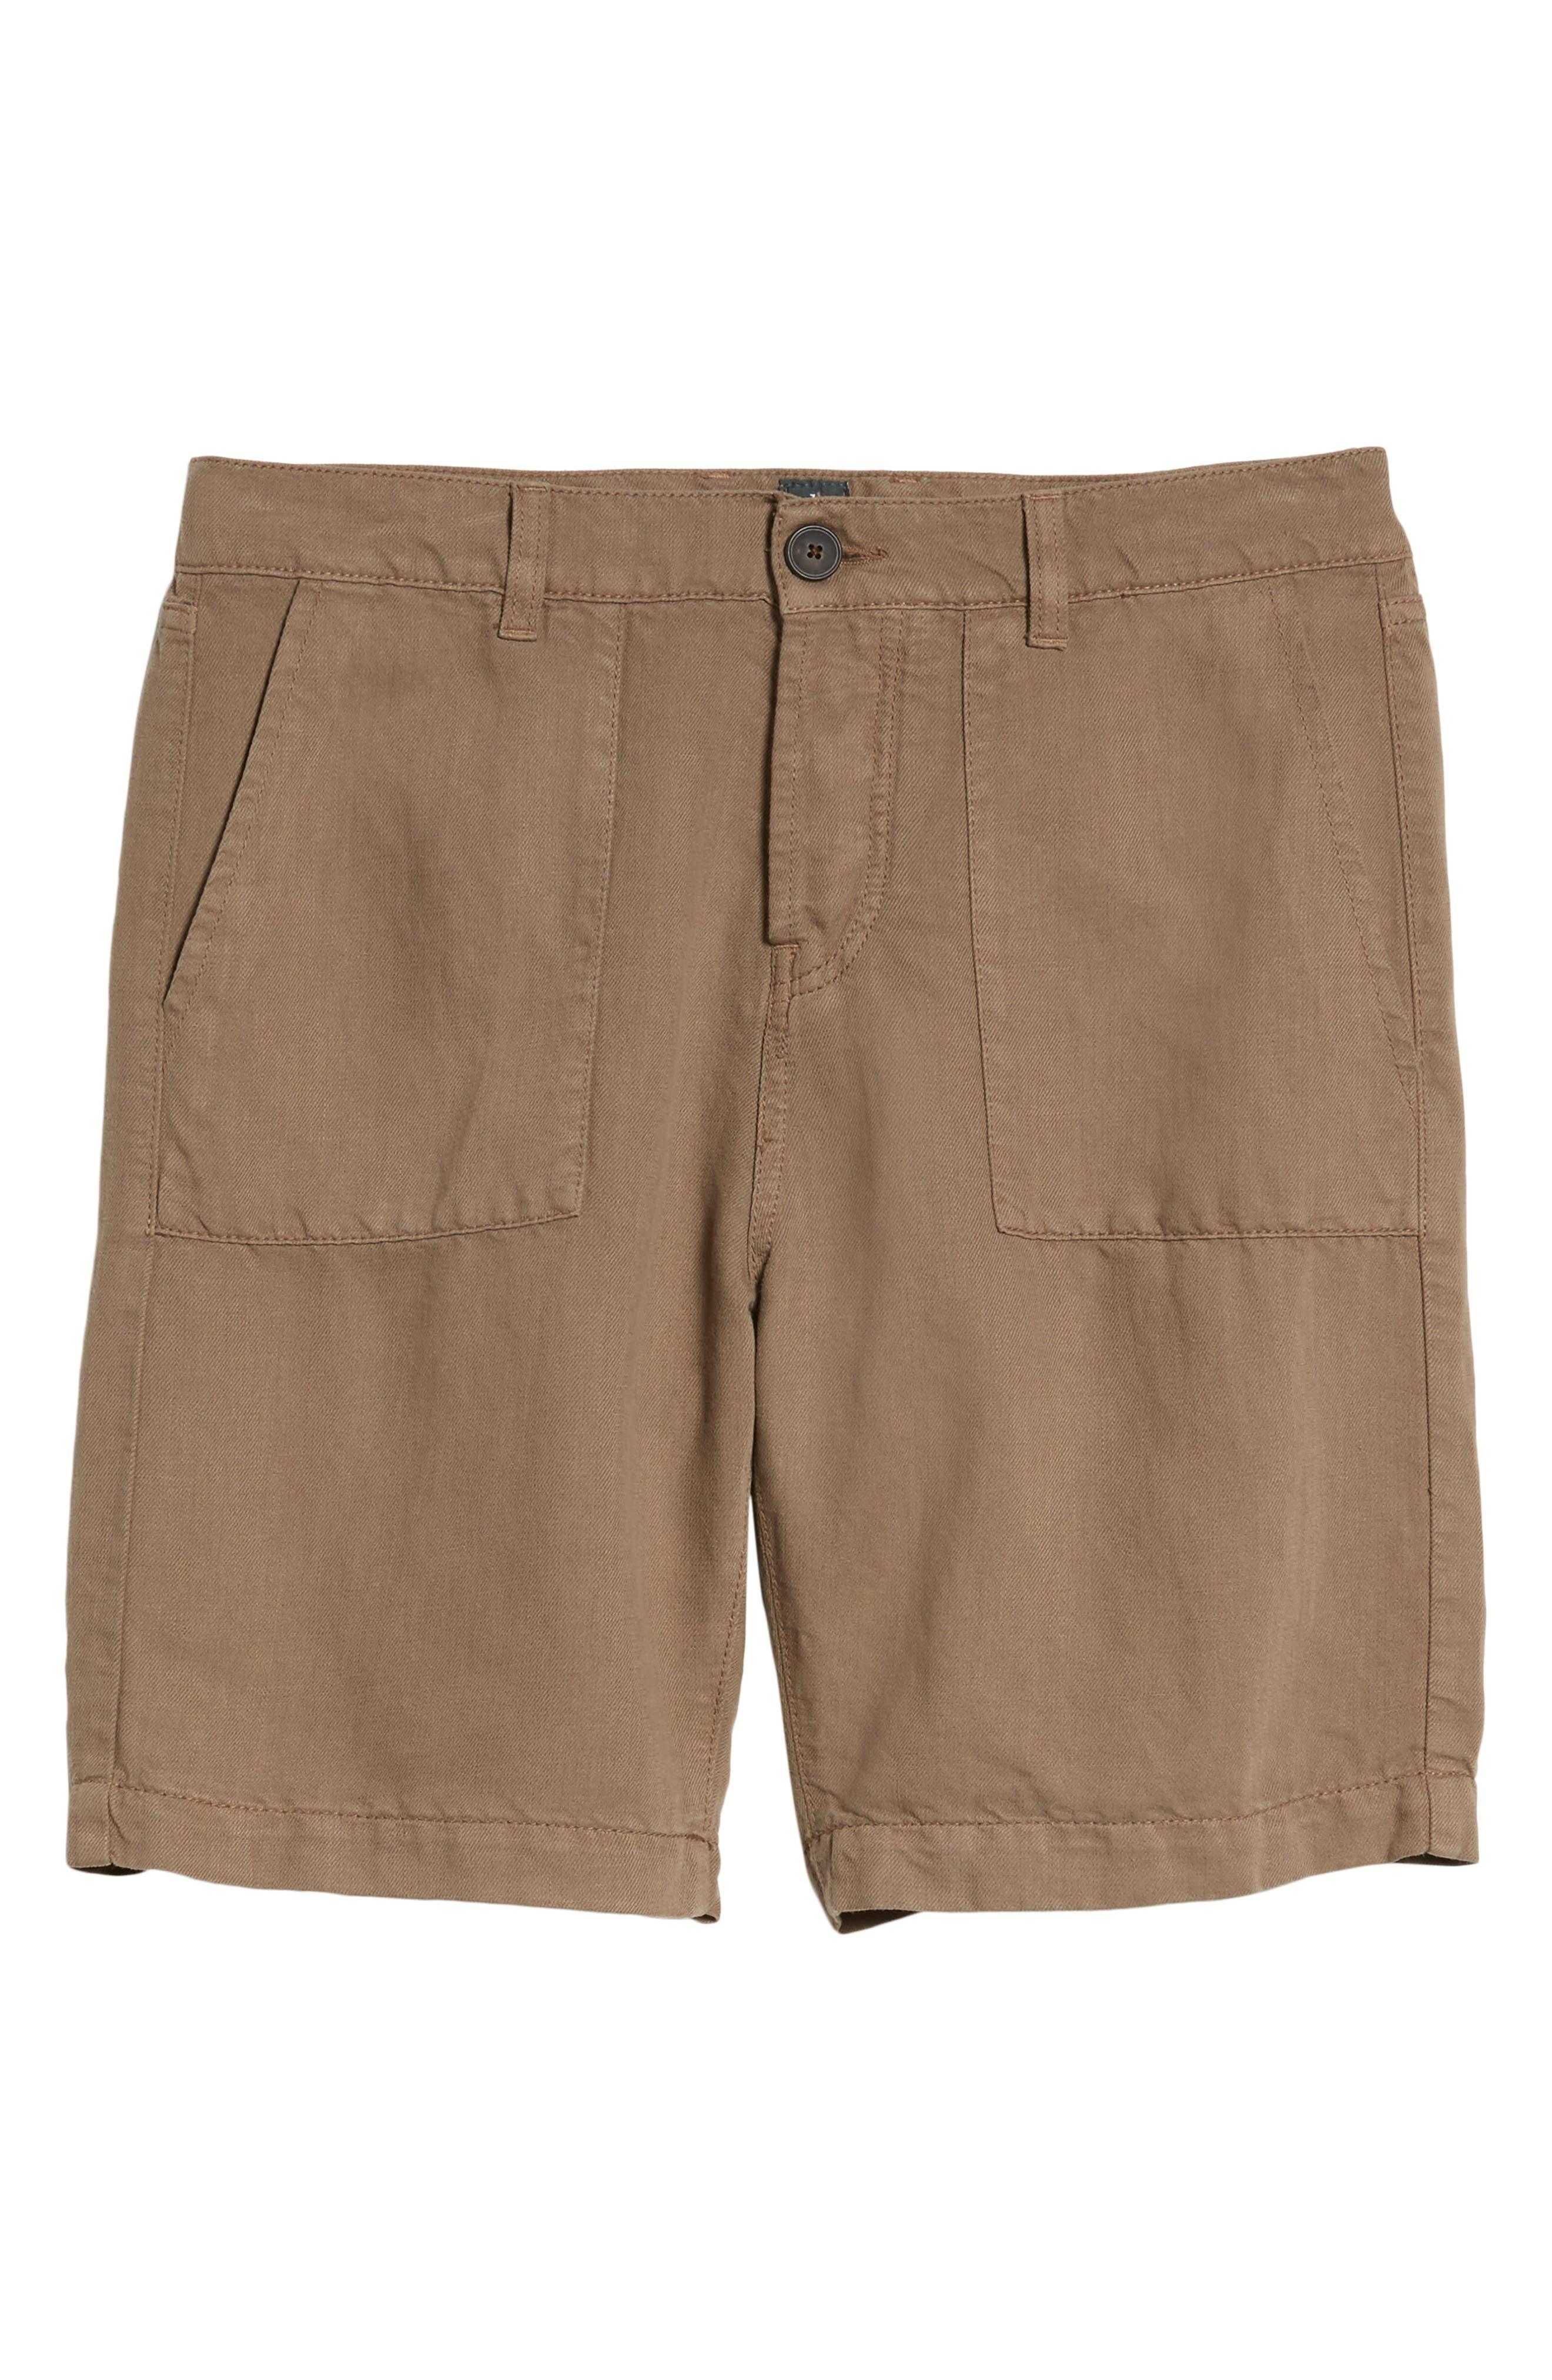 Fatique Bermuda Shorts,                             Alternate thumbnail 6, color,                             Taupe